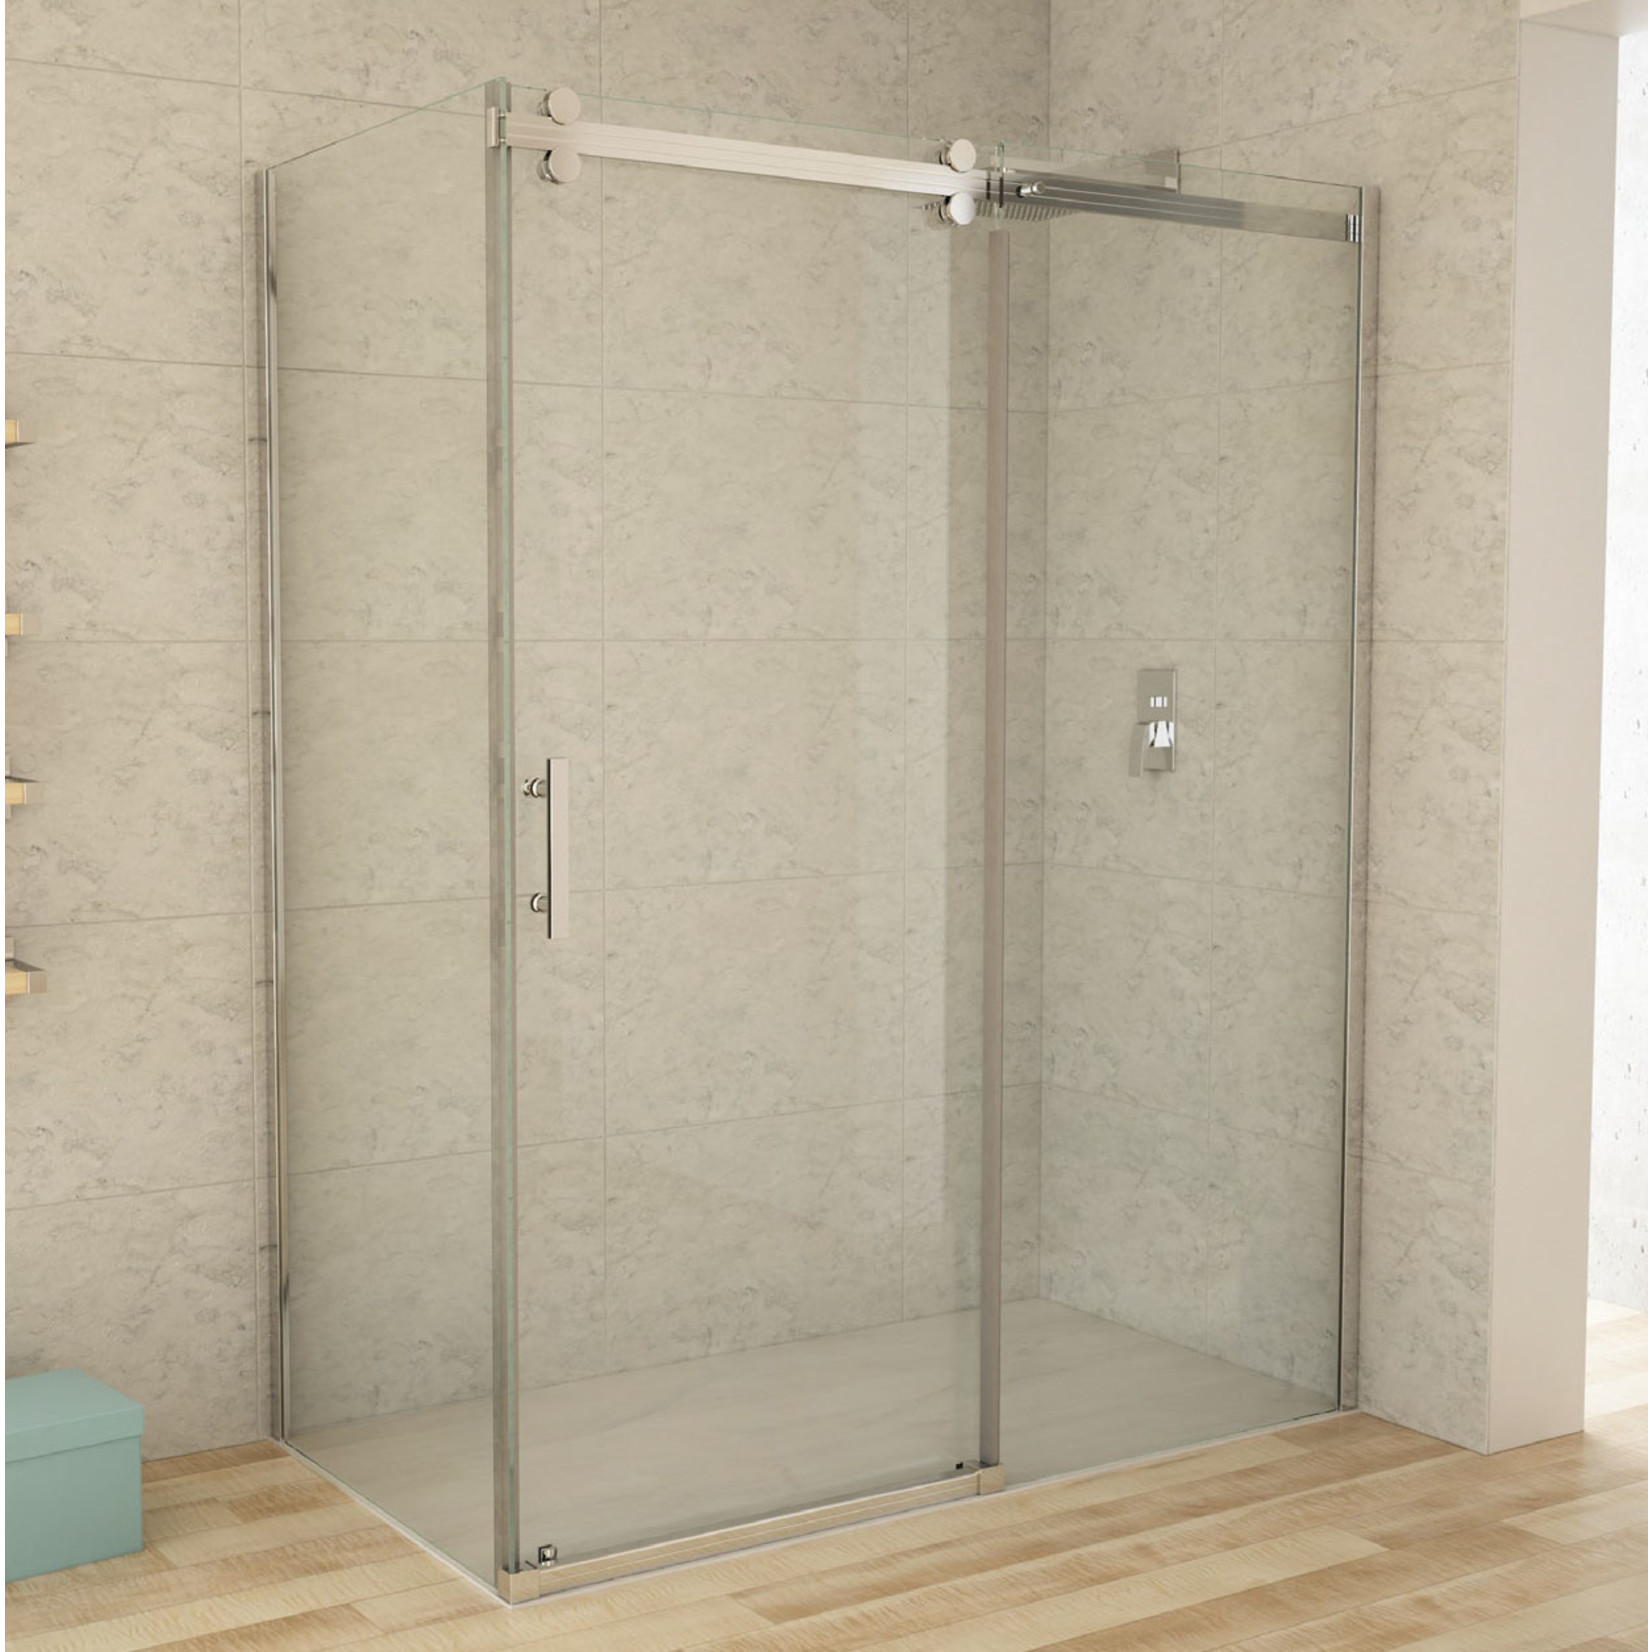 Reversible chrome shower set 36x60 CDC